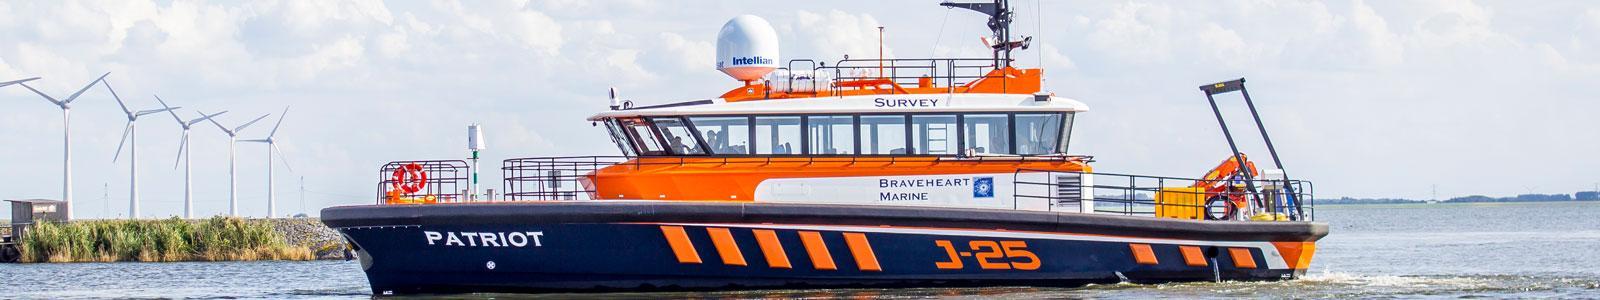 Projects-2017-09-workboats-windfarms-support-Javelin-international-Patriot-header.jpg